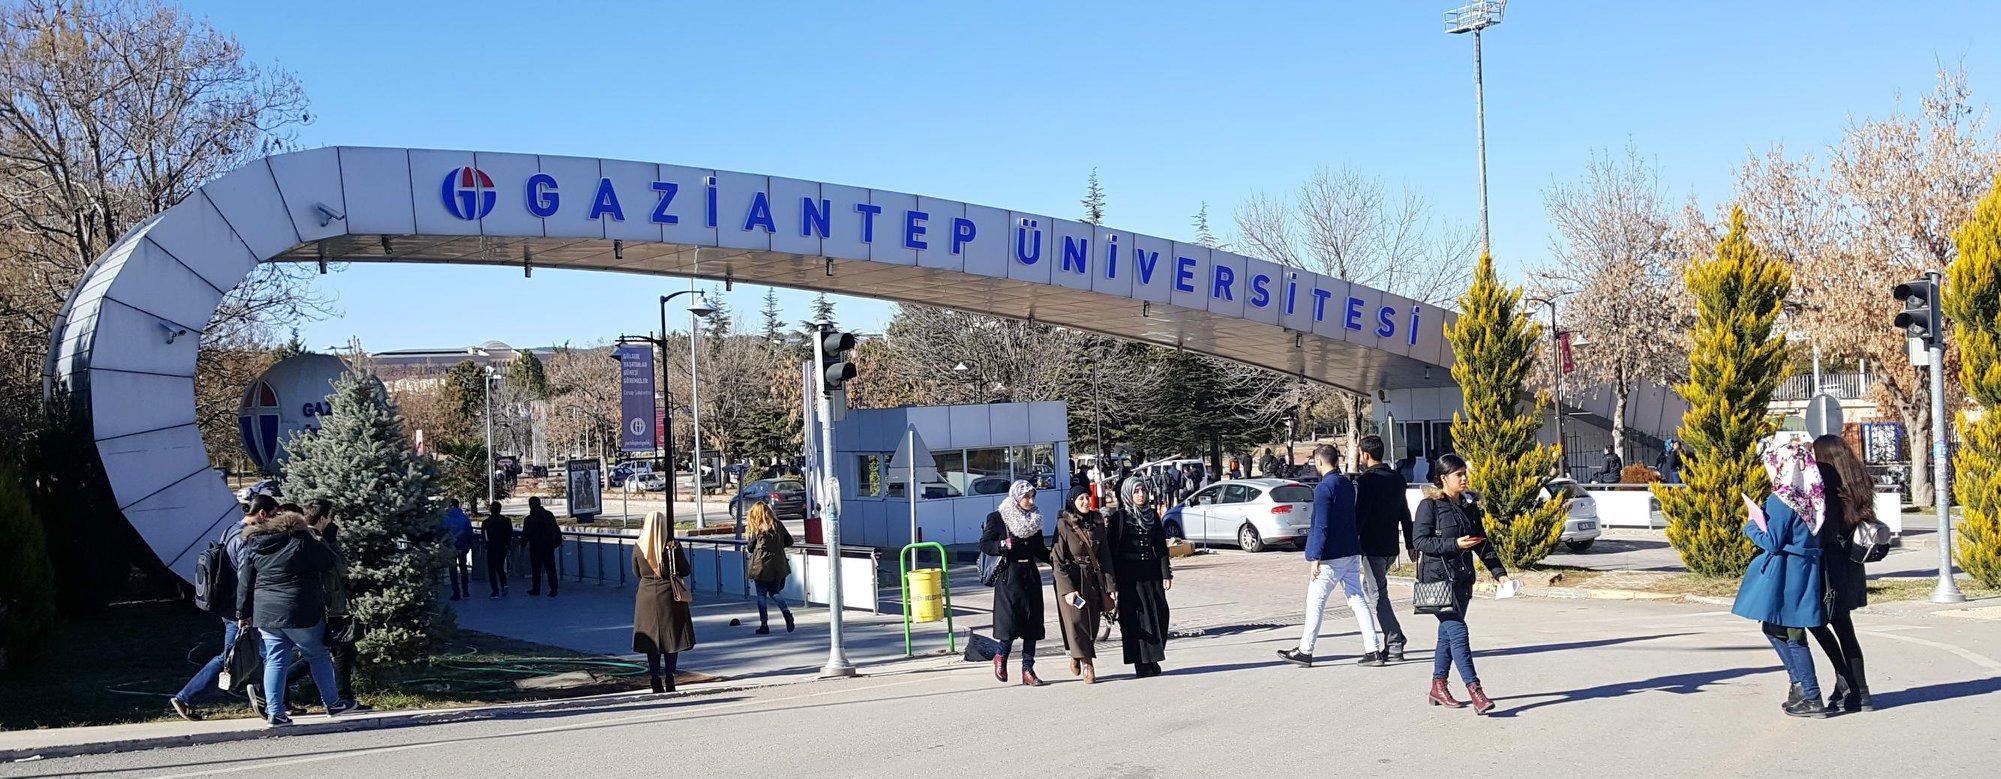 Gaziantep University - GAUN Campus